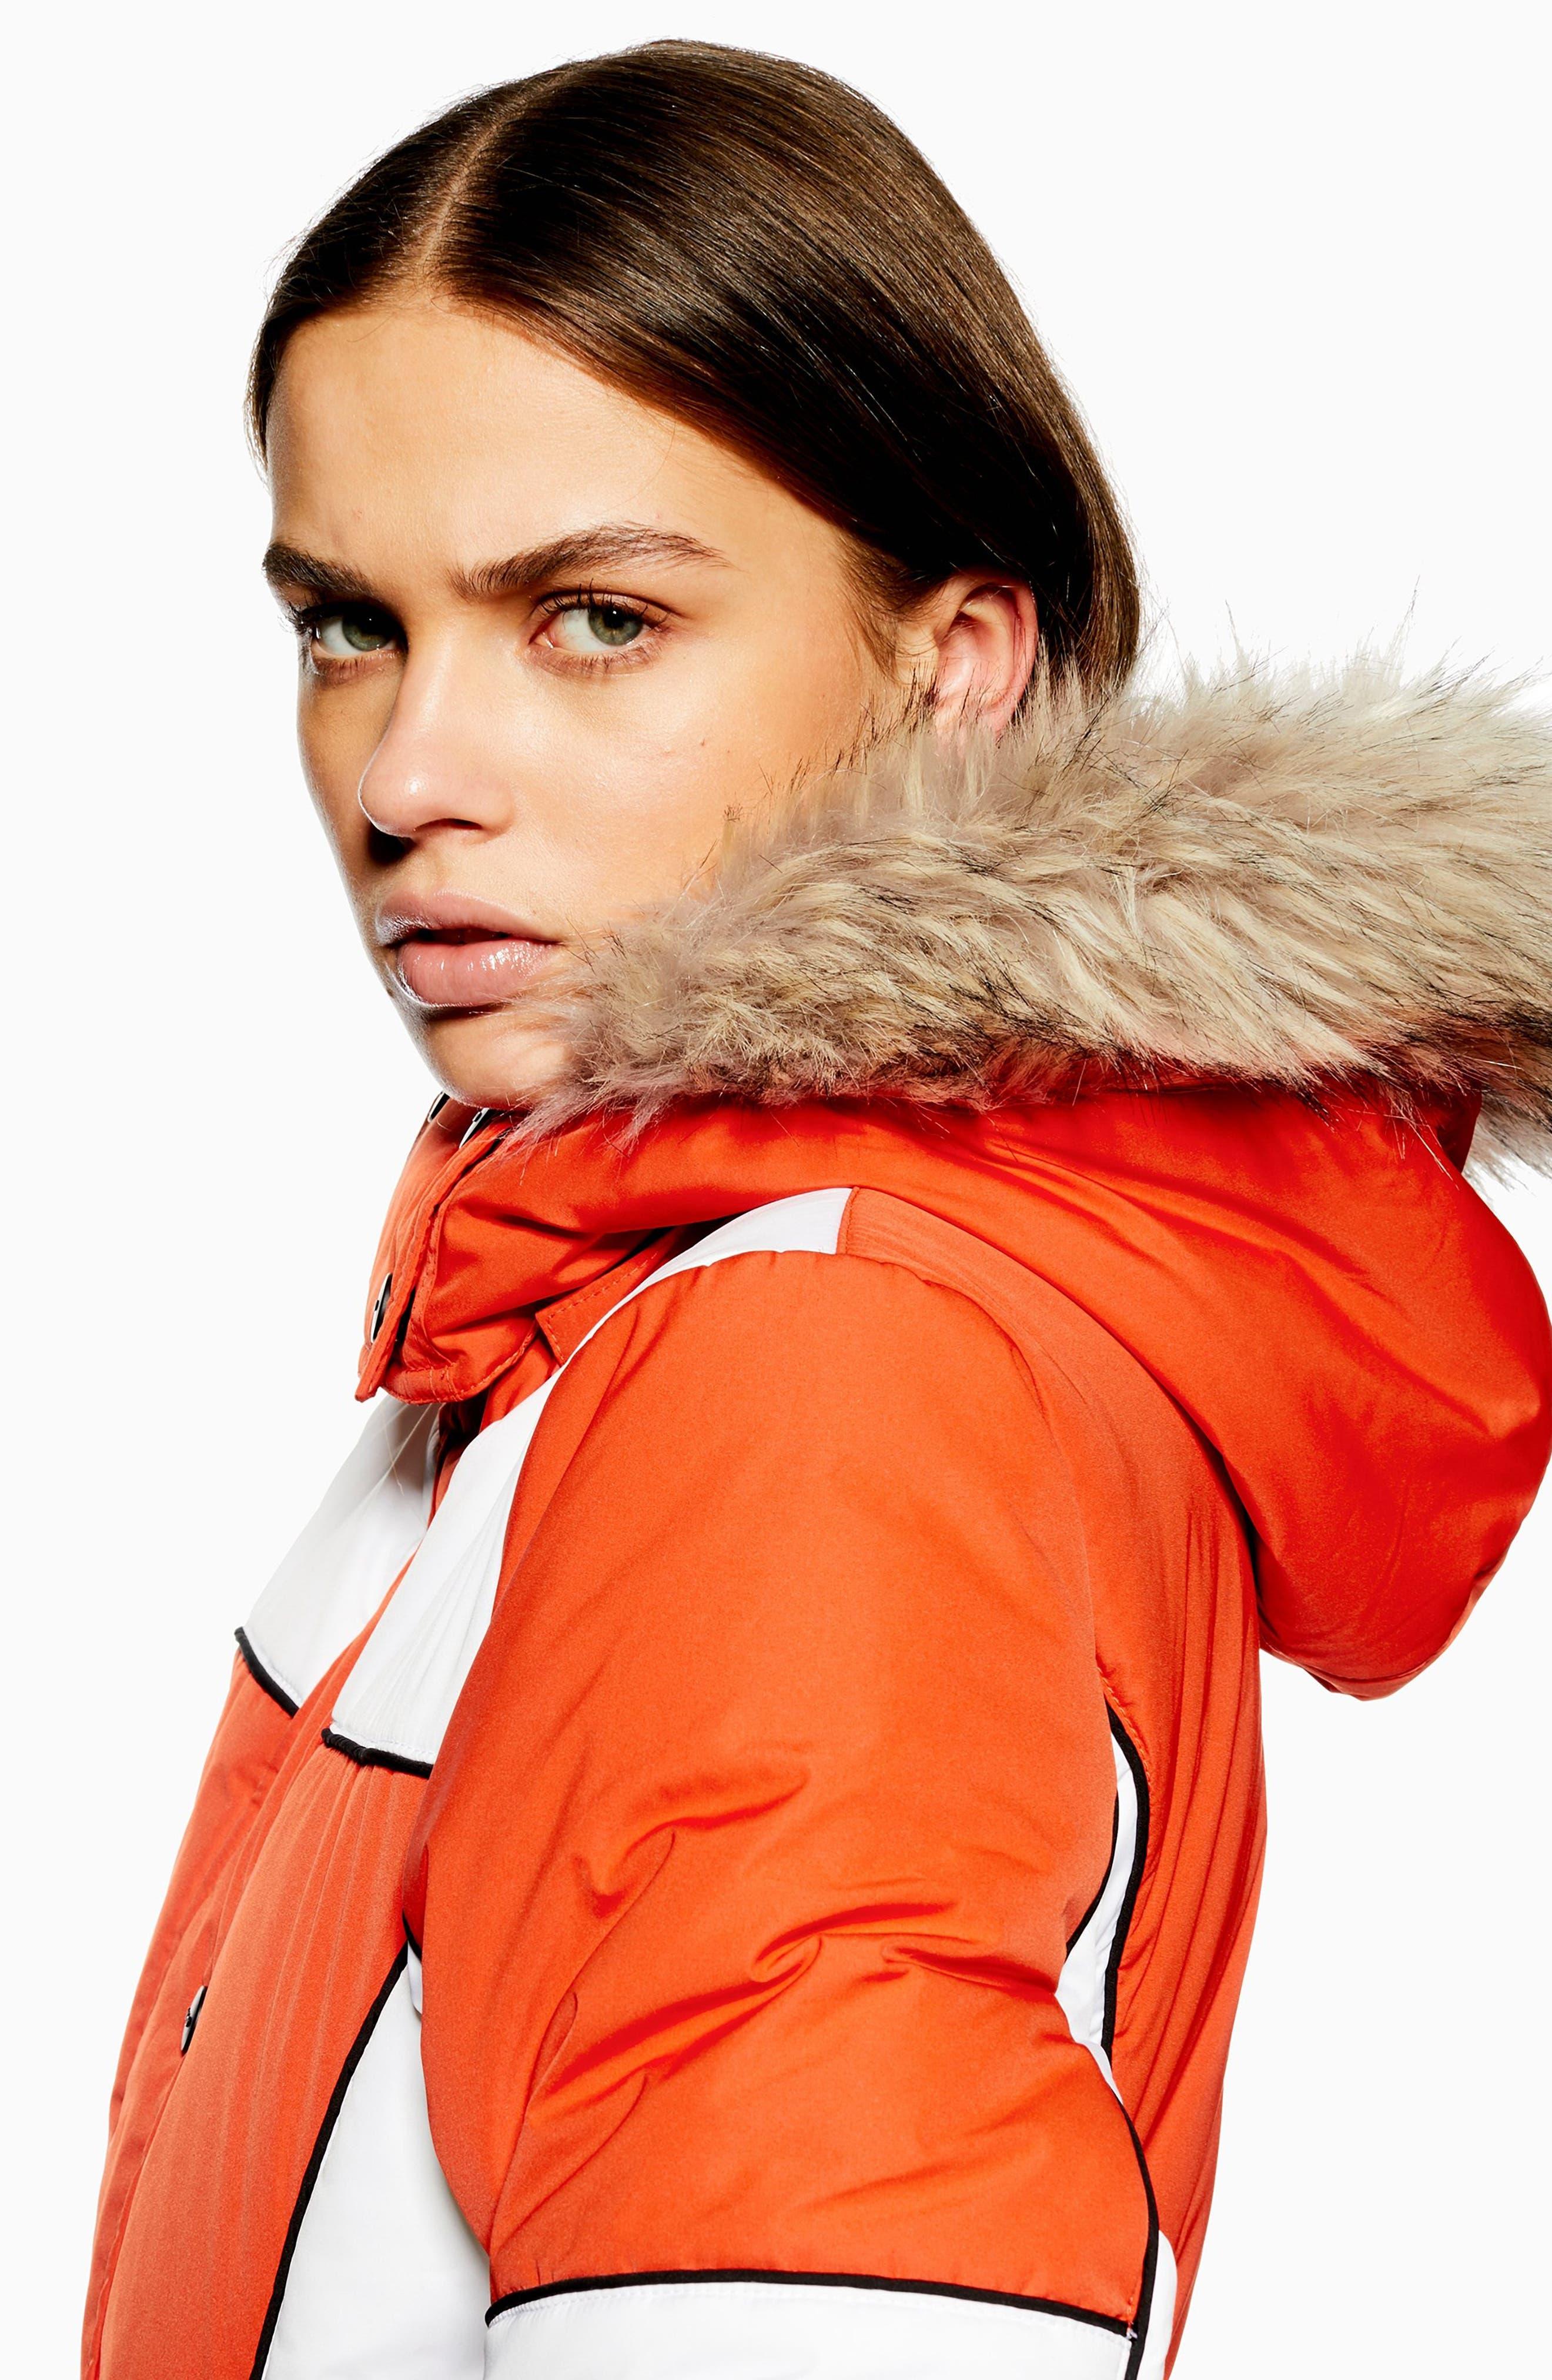 Sno Faux Fur Trim Puffer Jacket,                             Alternate thumbnail 6, color,                             ORANGE MULTI